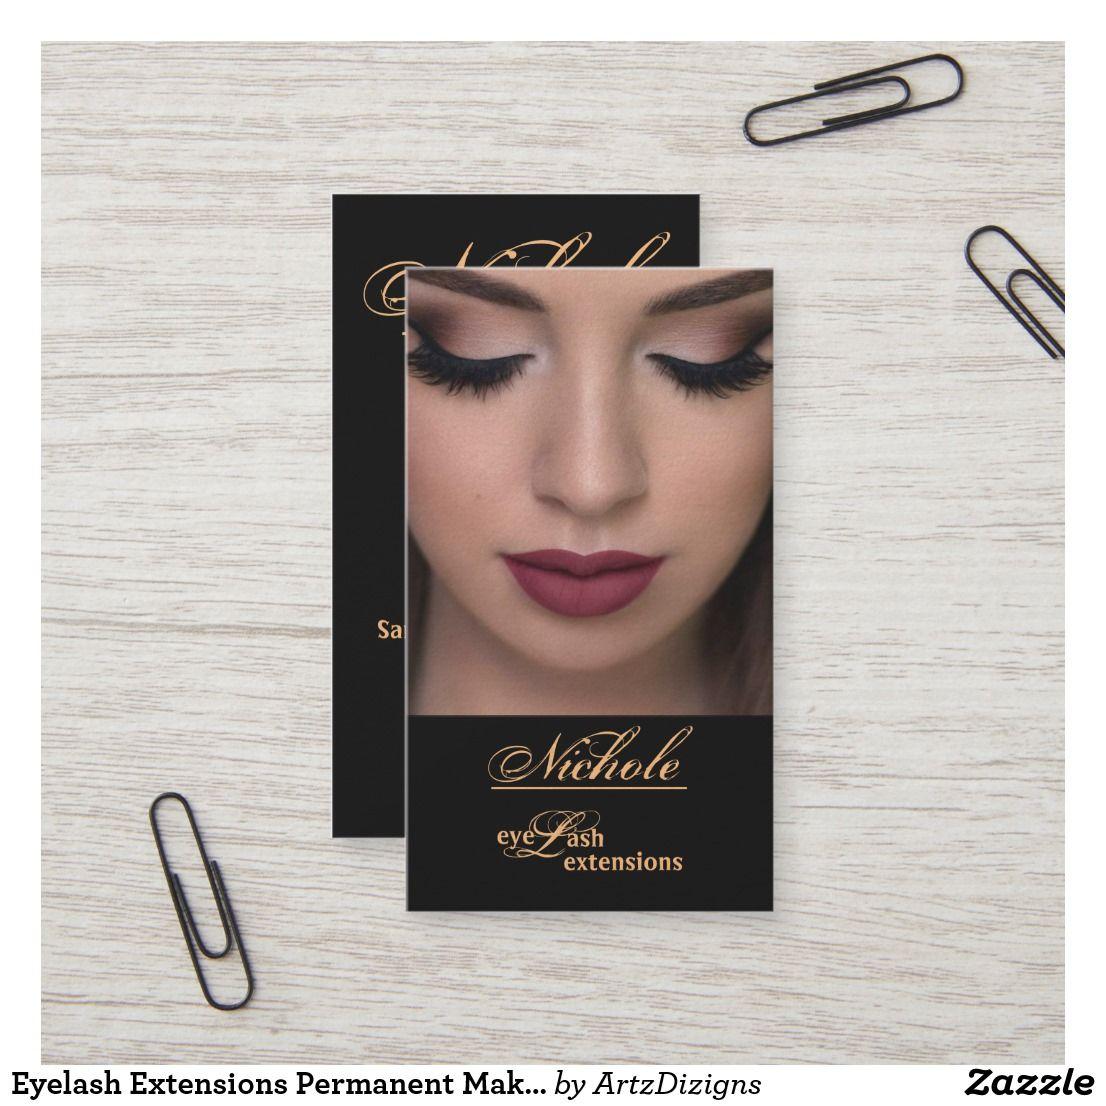 Eyelash extensions permanent makeup business cards